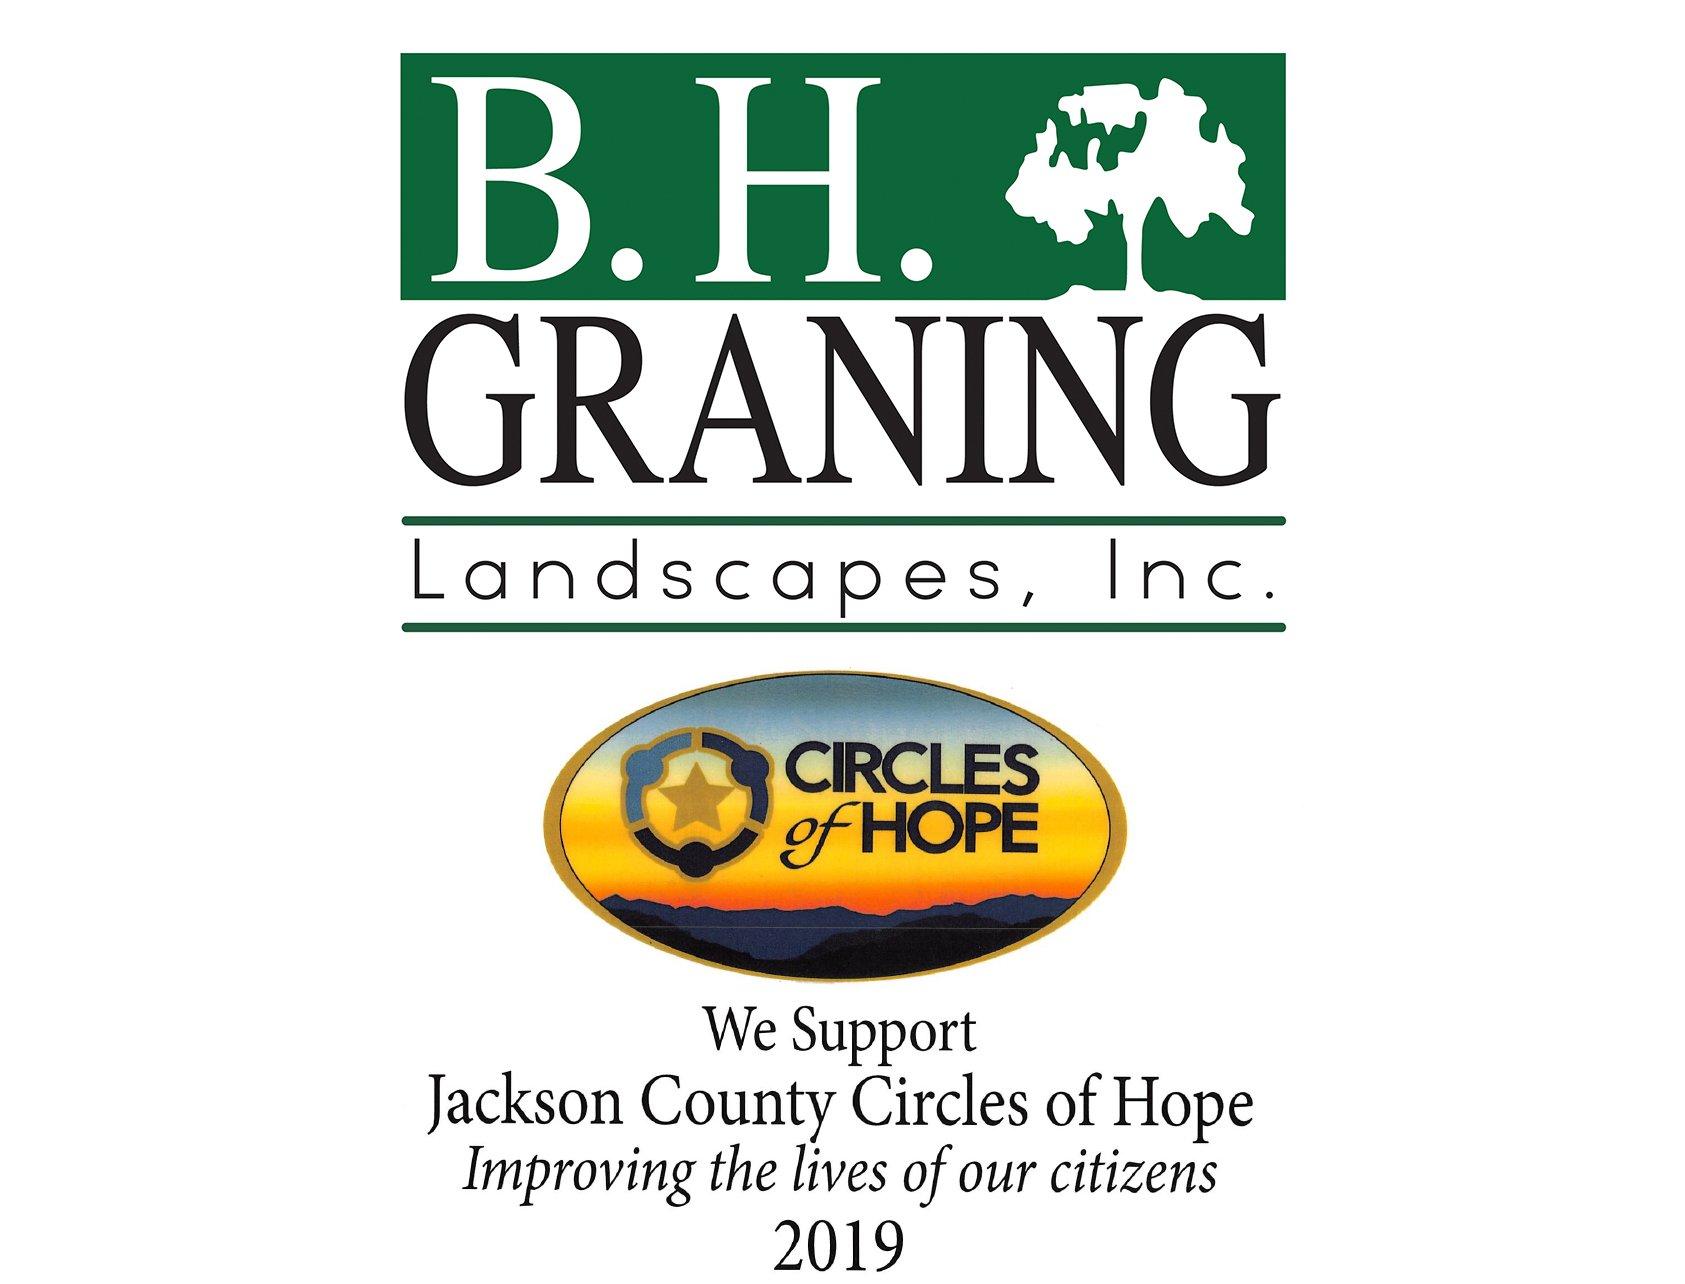 Jackson County Circles of Hope